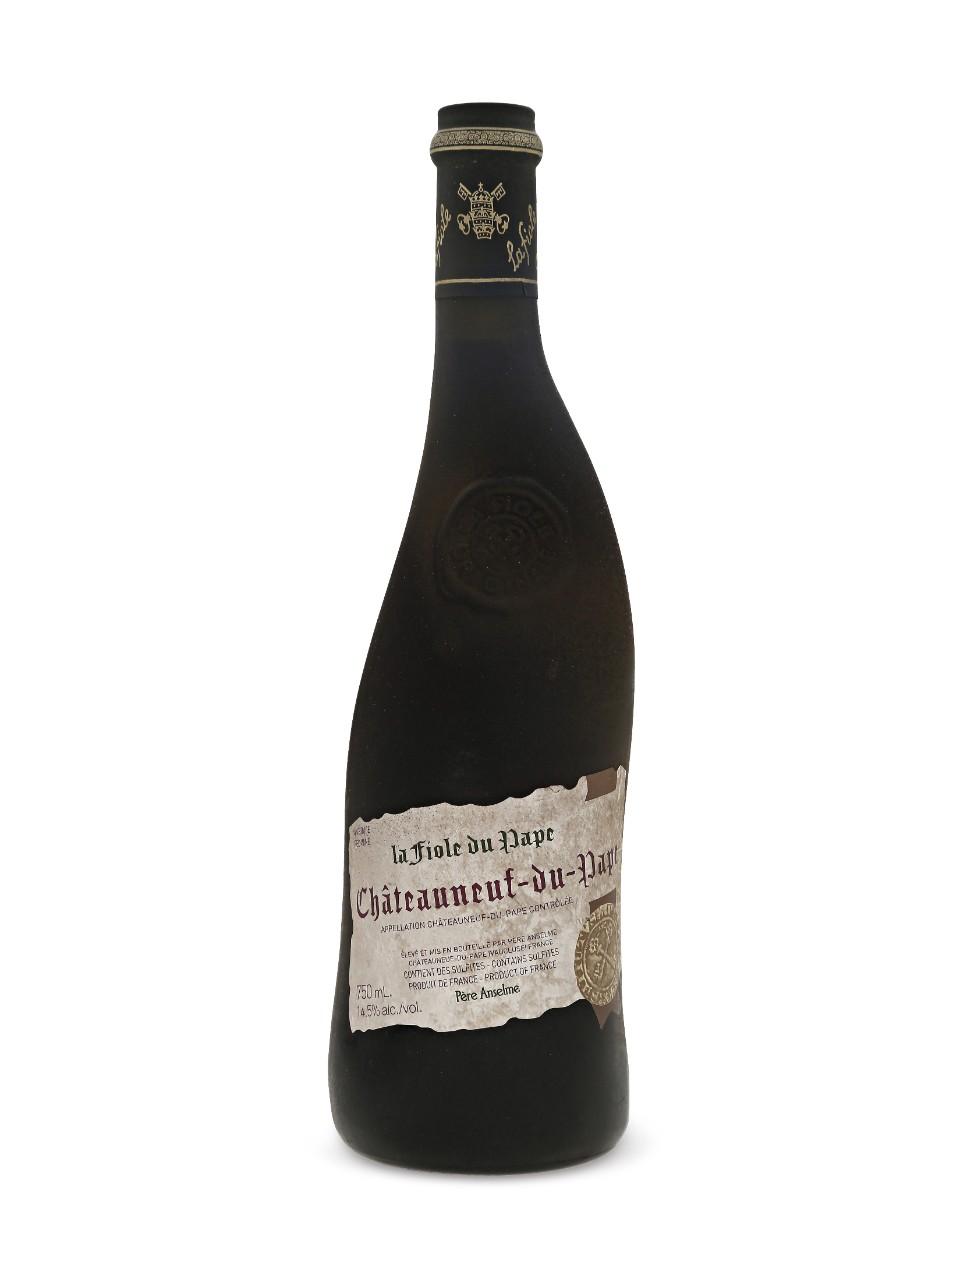 Fiole du Pape wine bottle